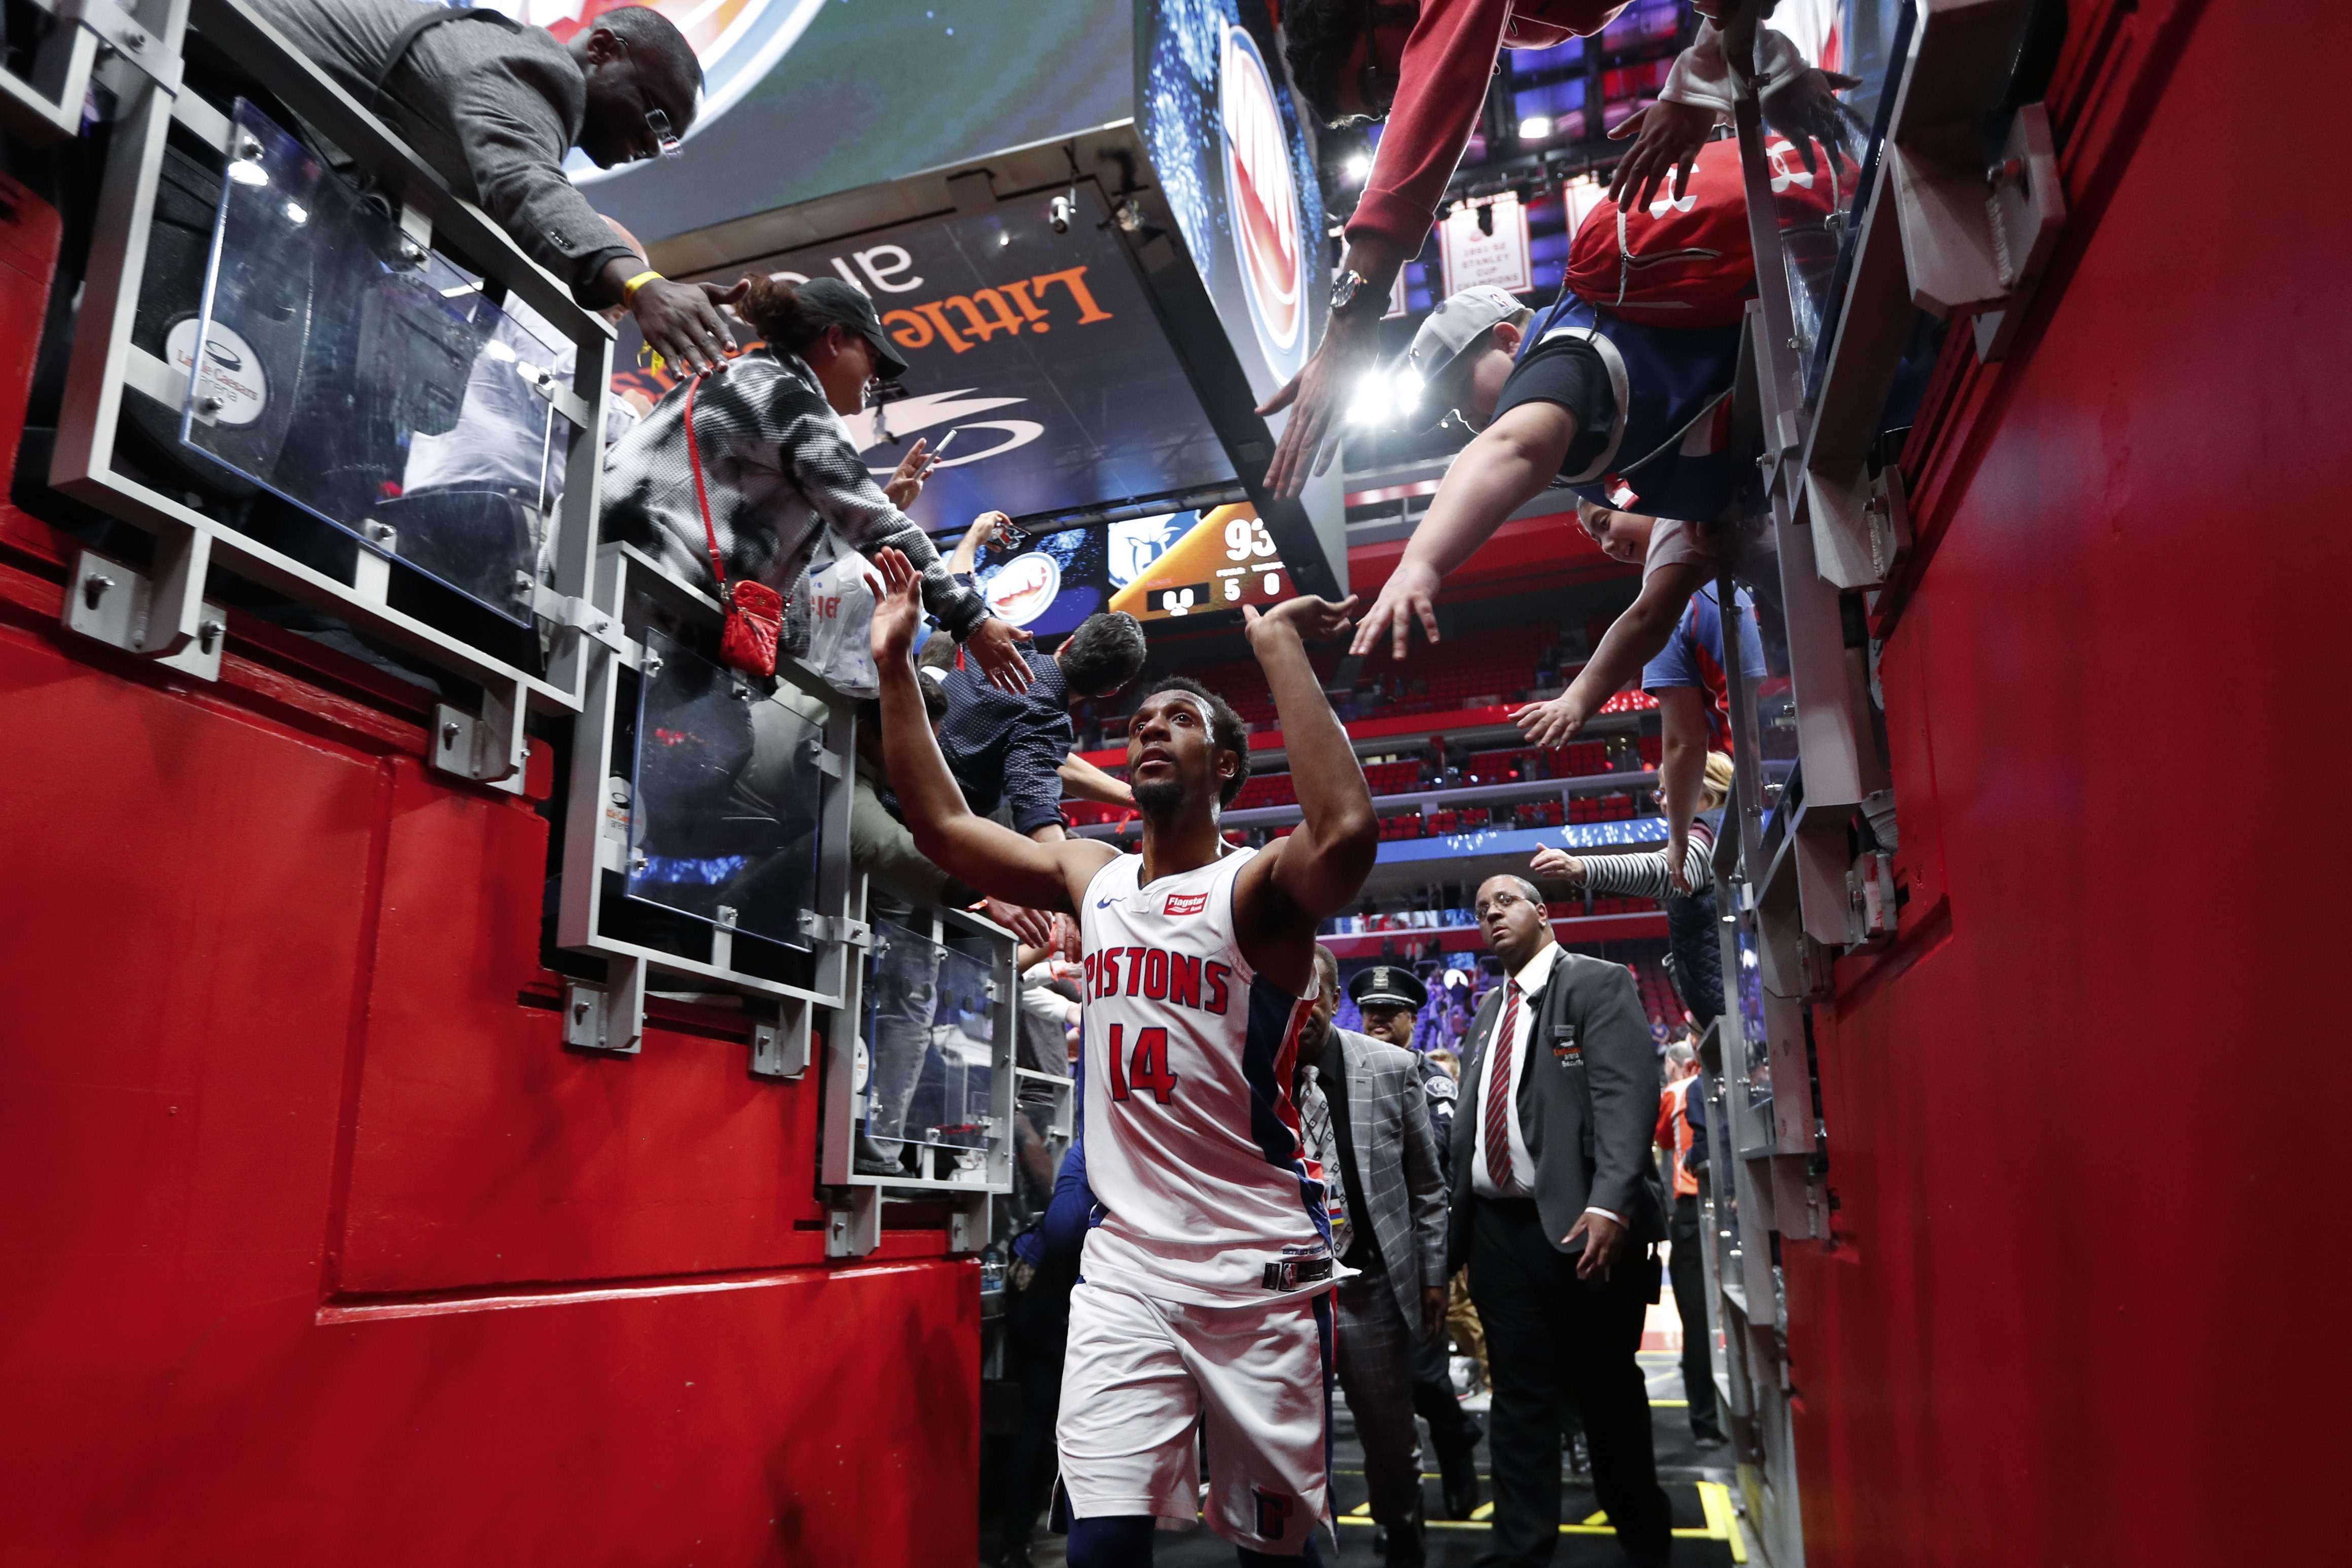 Pistons vencen a Grizzlies y se aferran a boleto de playoffs